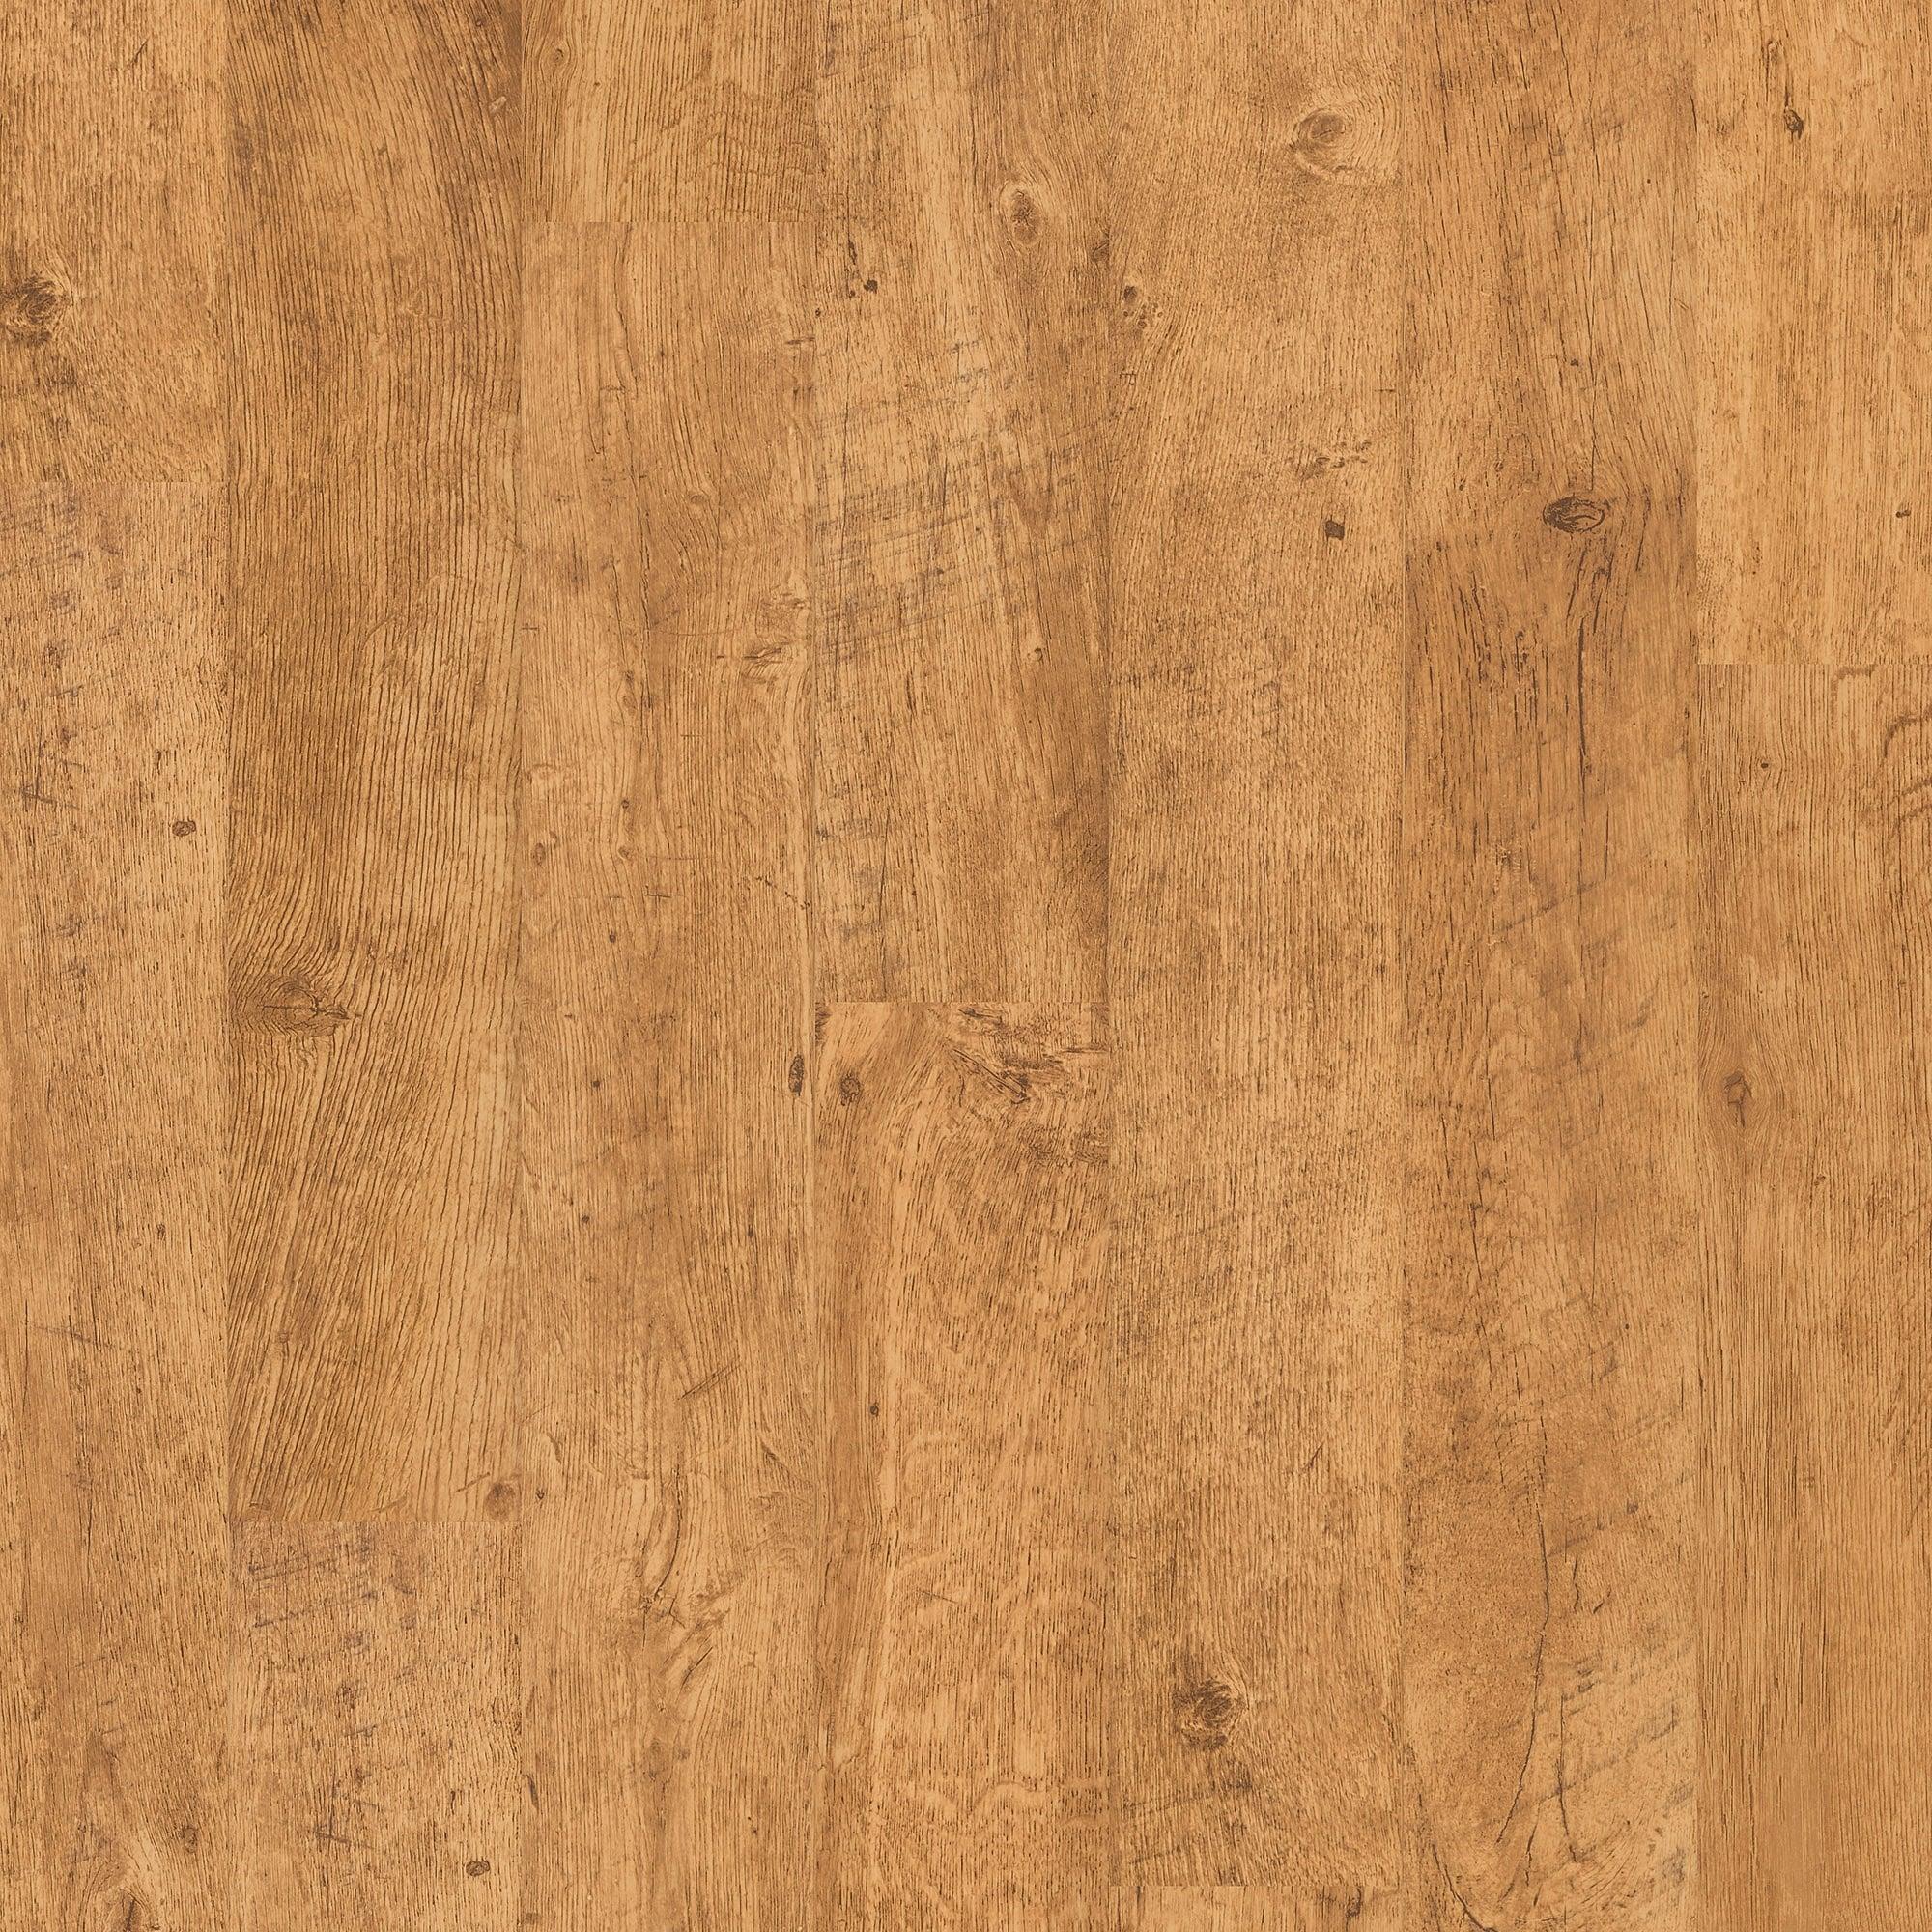 Uk Flooring Direct Harvest Oak Laminate: Quickstep Eligna 8mm Harvest Oak Laminate Flooring